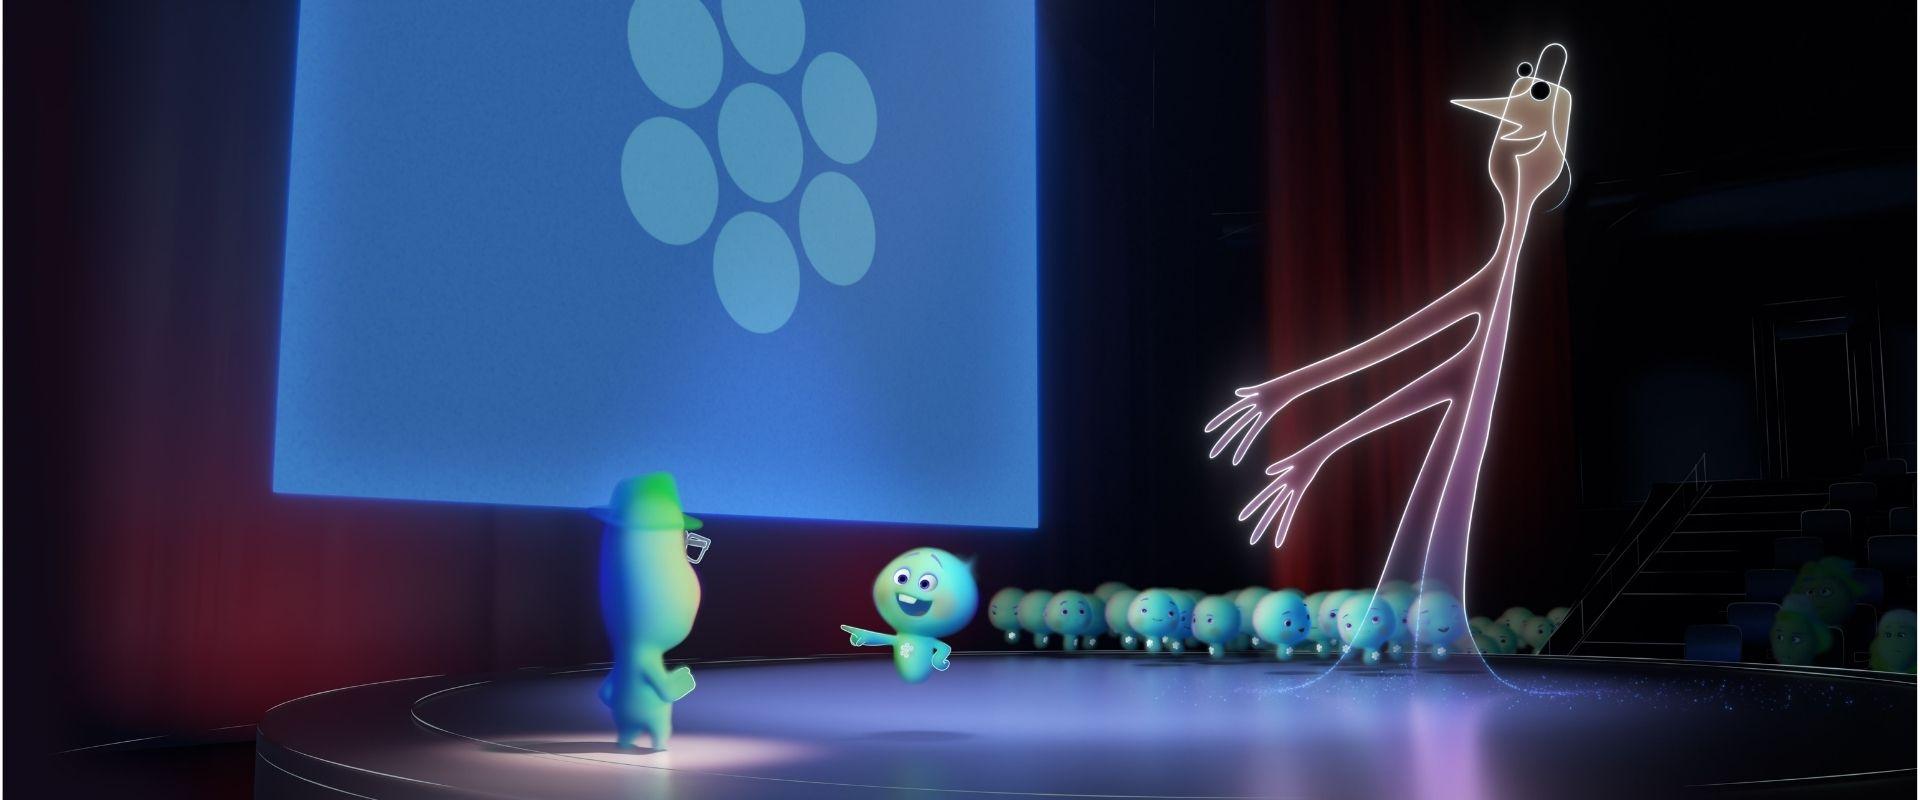 Disney Pixar's Soul